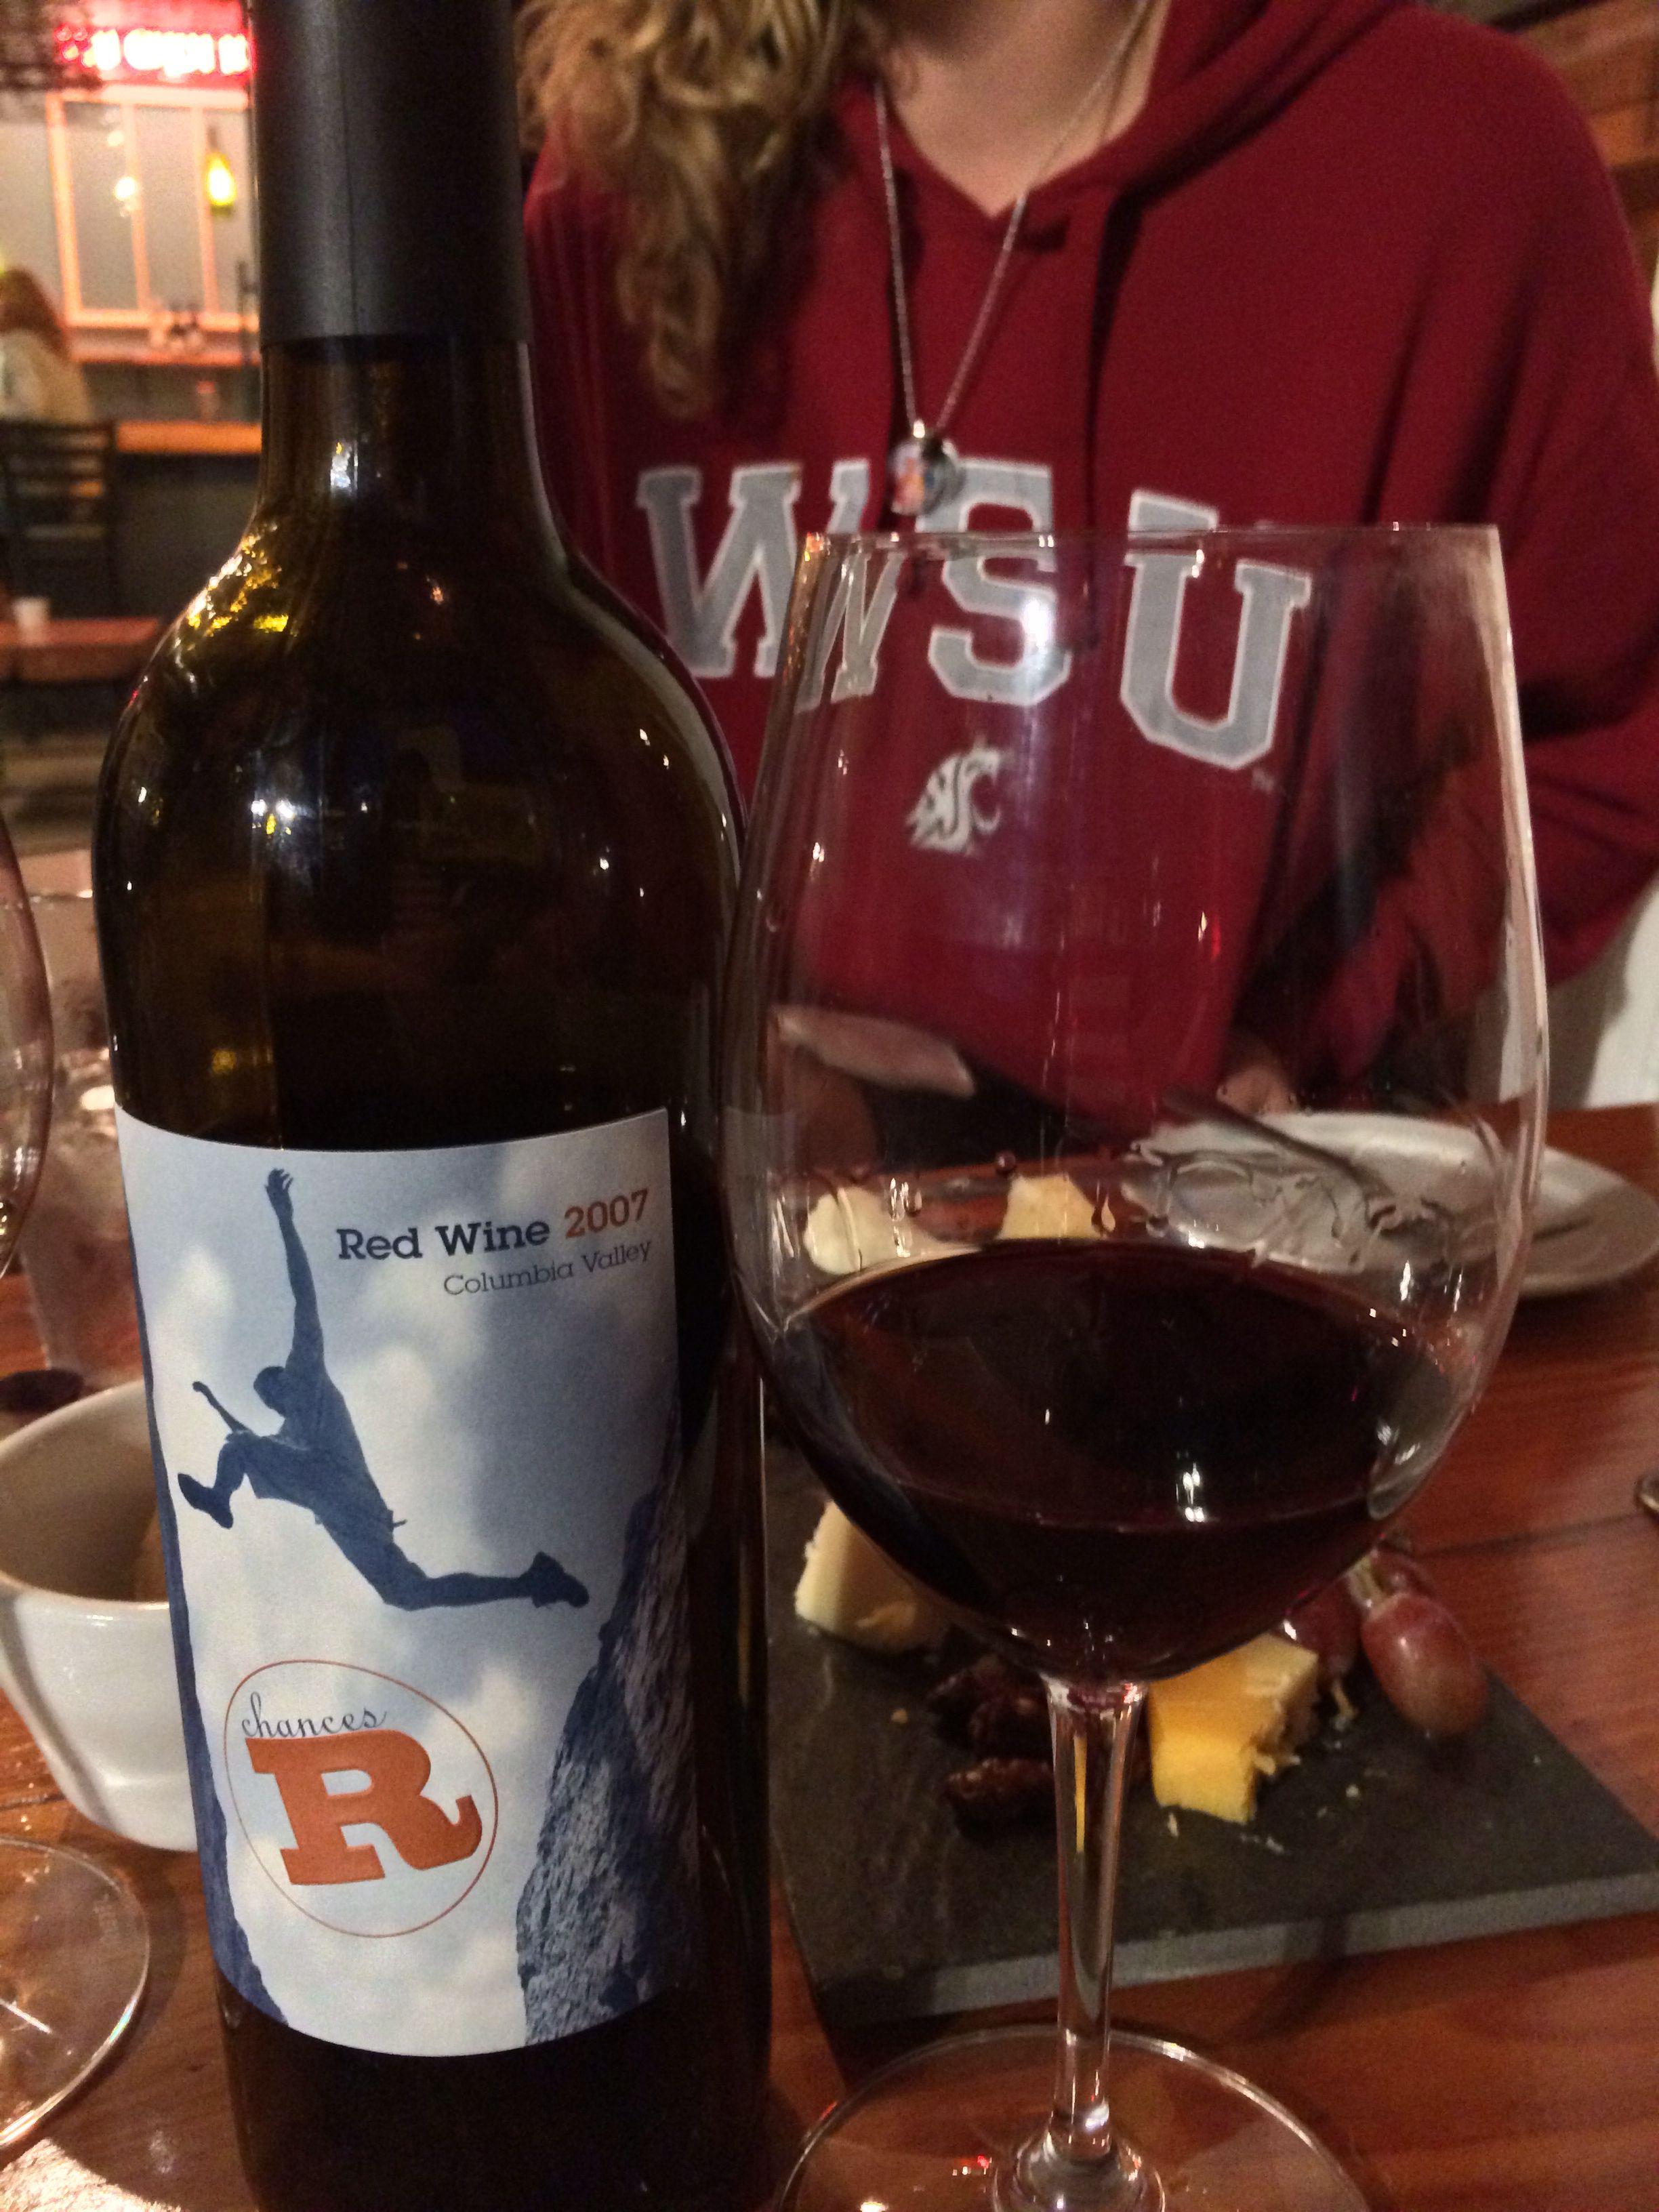 Chances R Watermill Winery Walla Walla Wine Bottle Red Wine Alcoholic Drinks